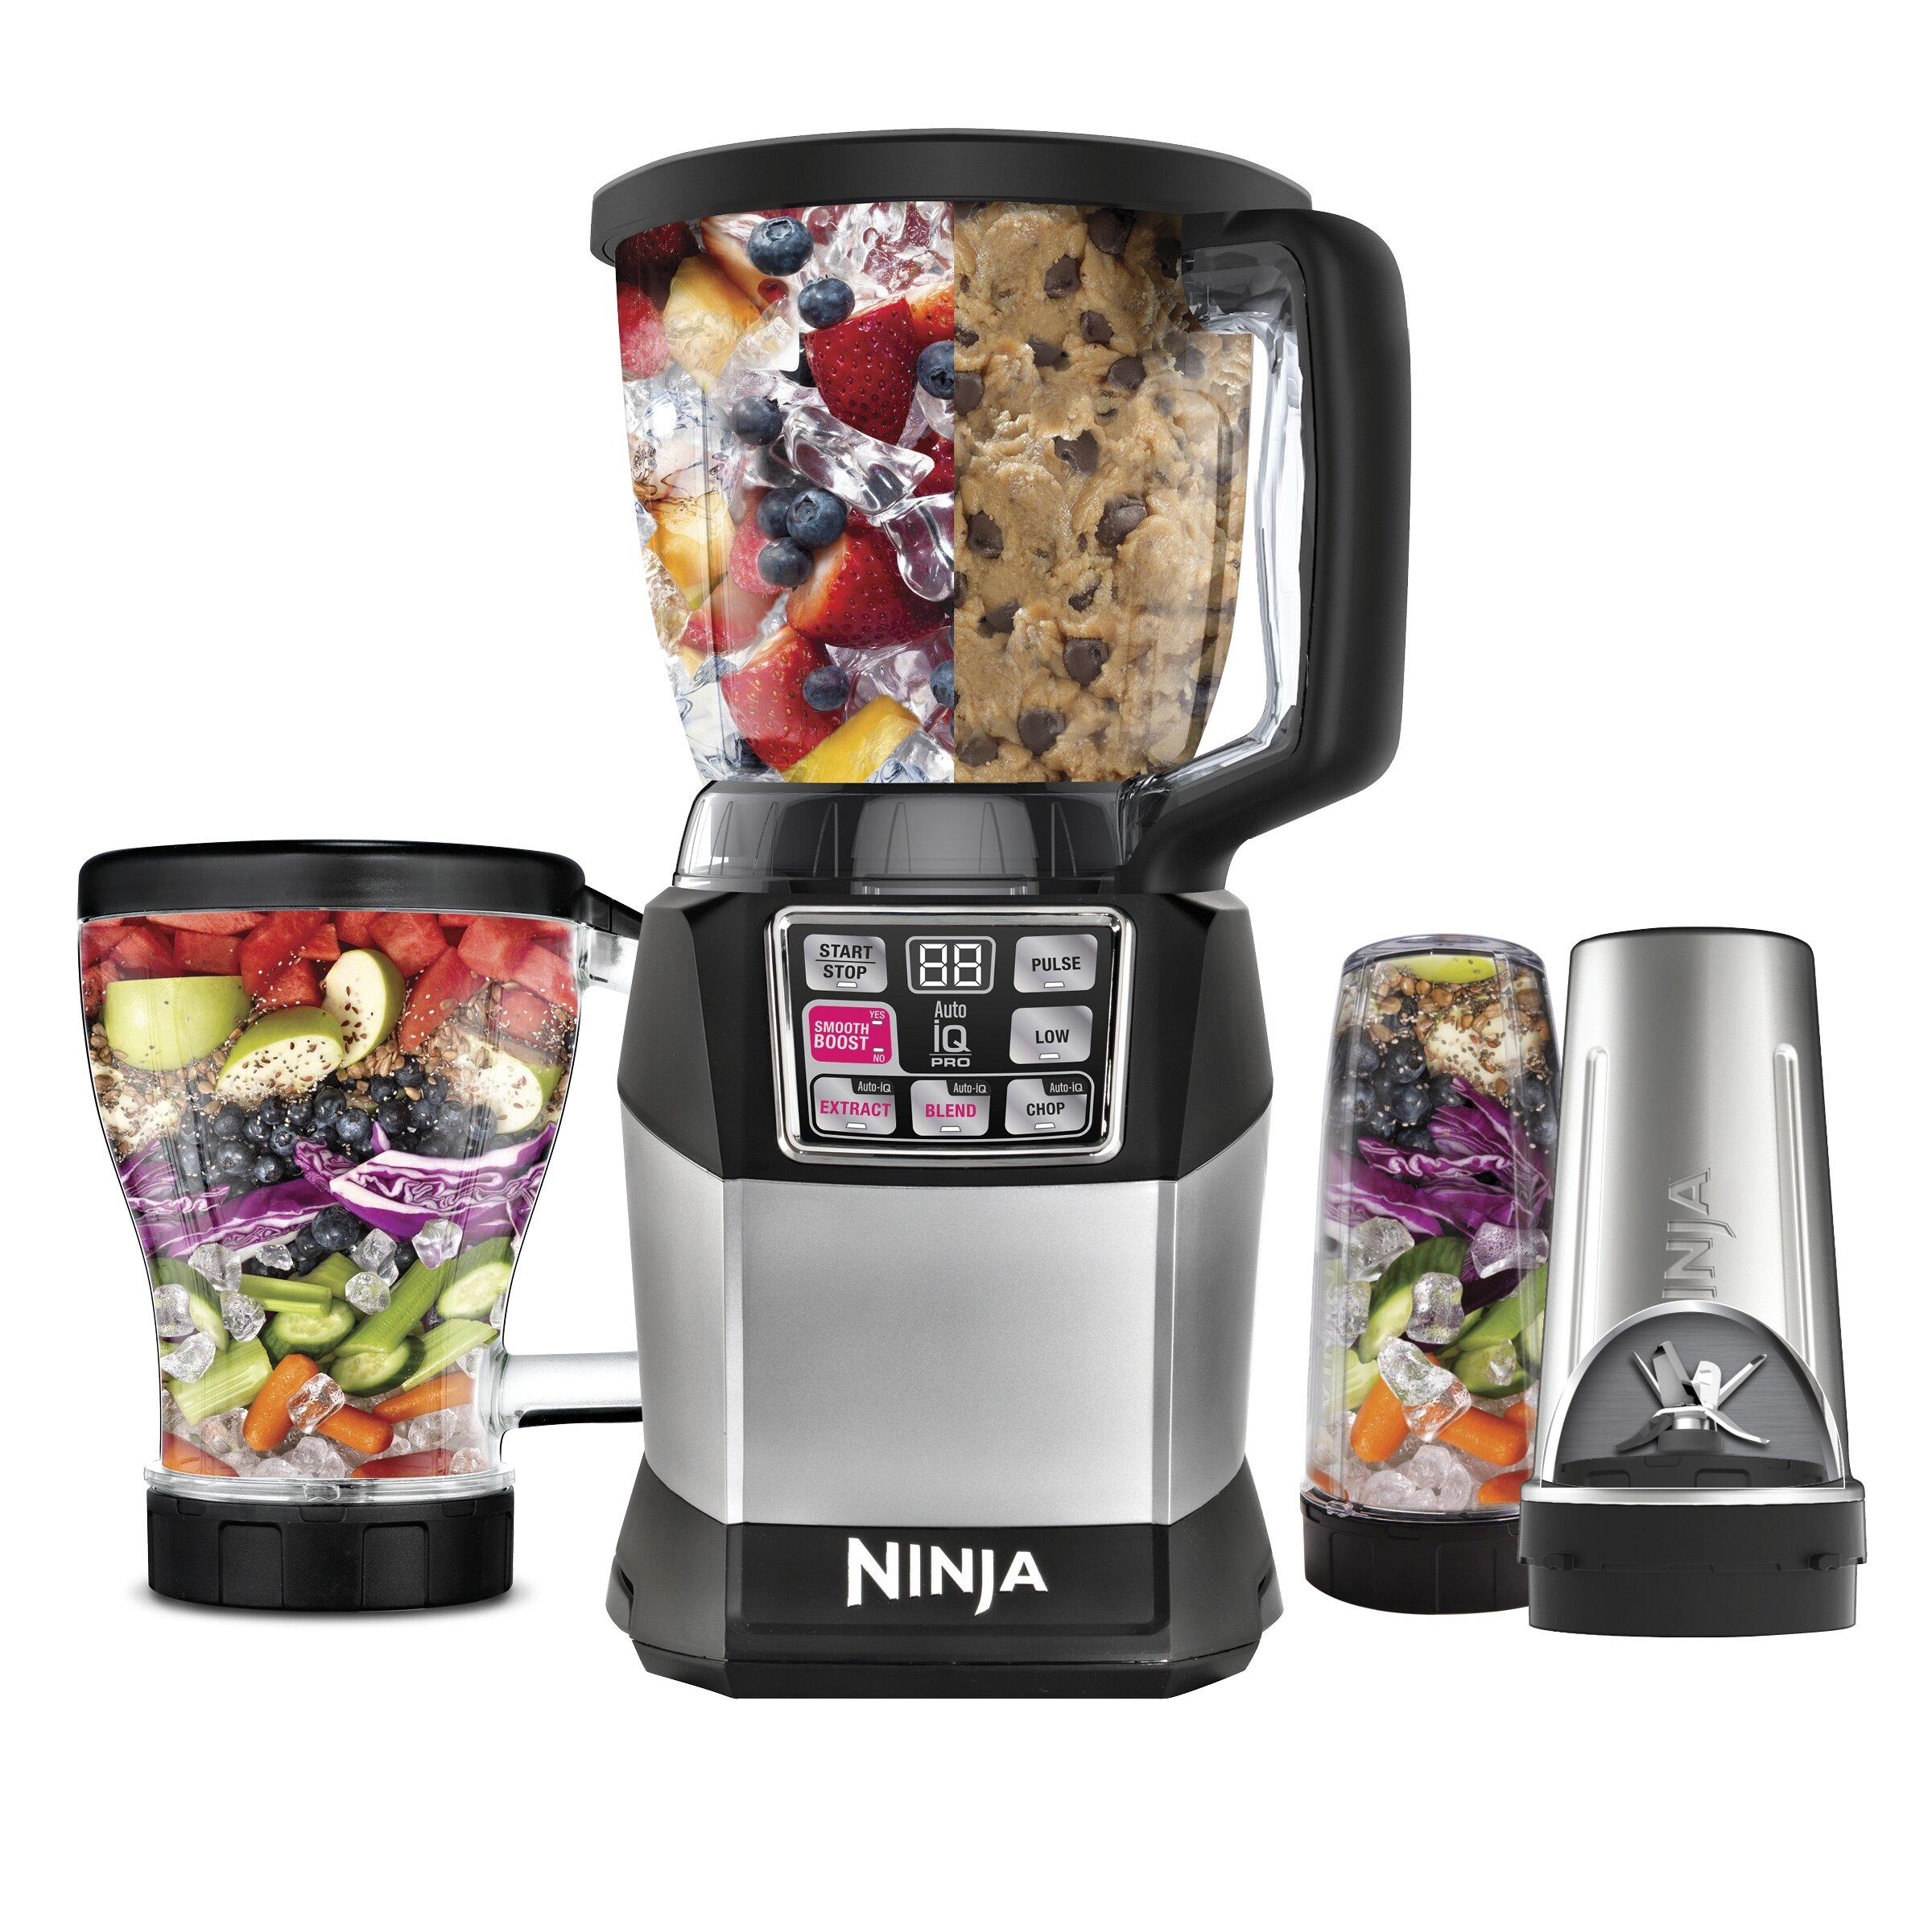 Ninja Nutri Auto-iQ Compact System